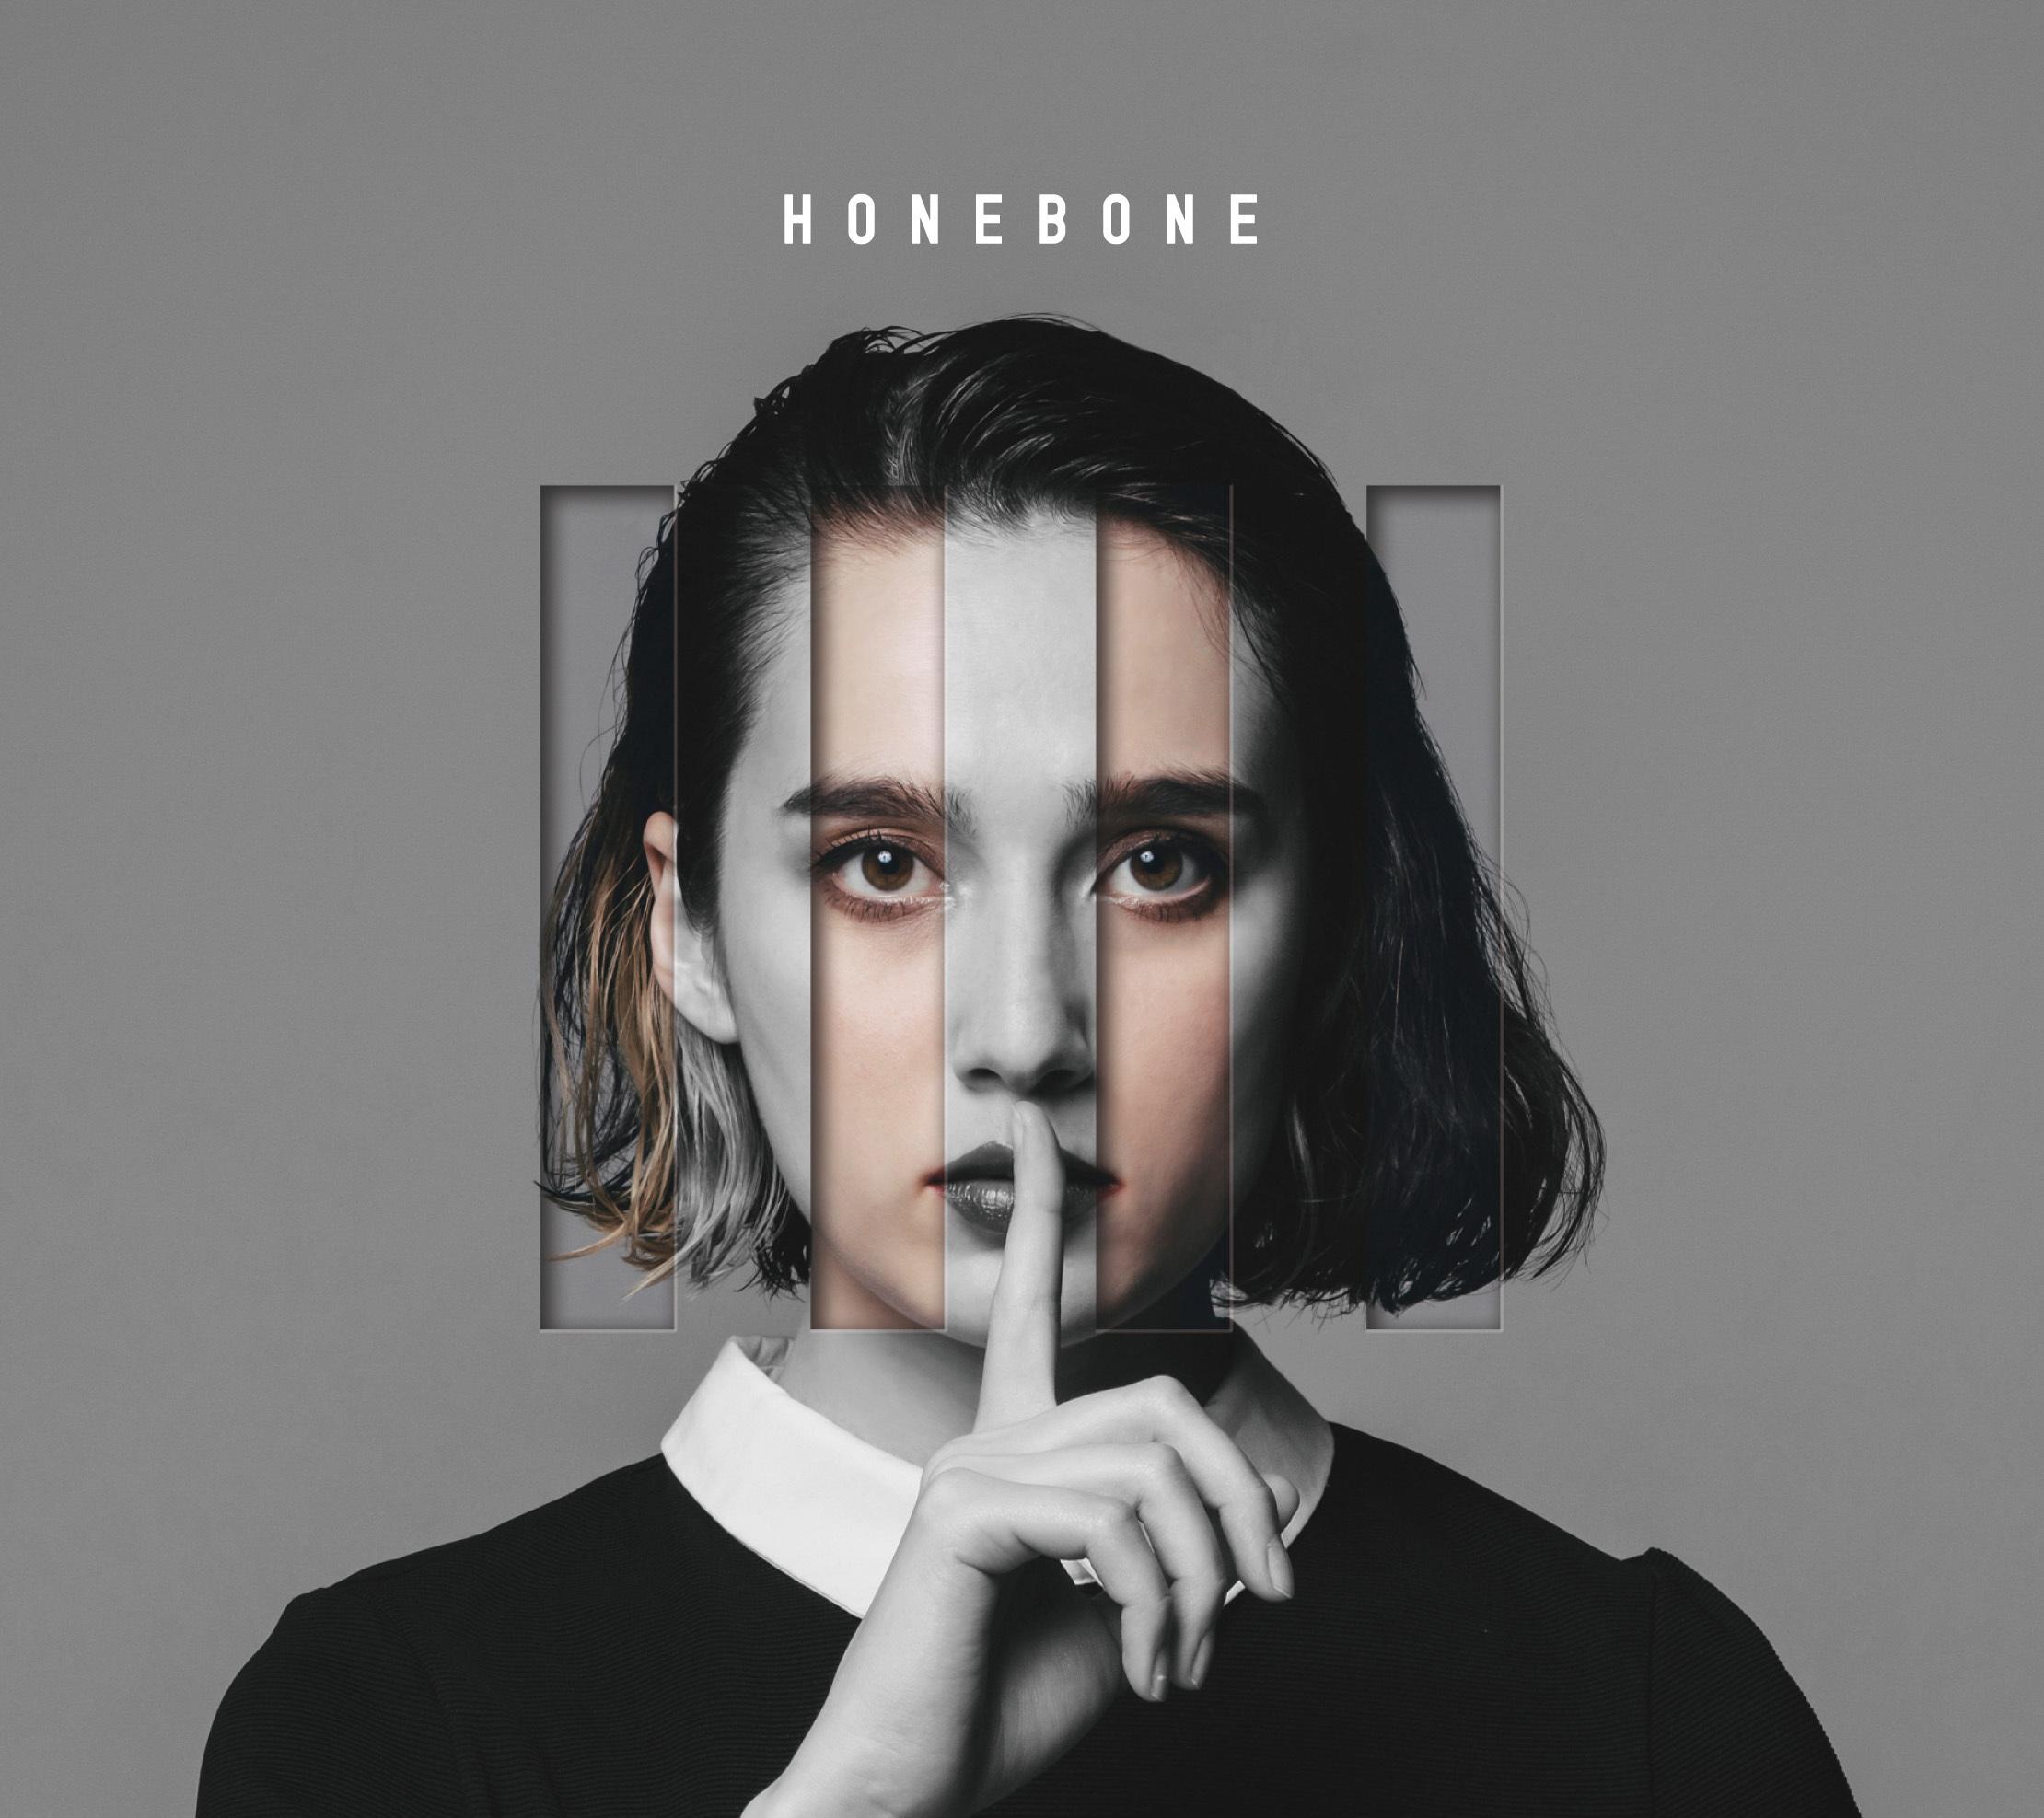 HONEBONE